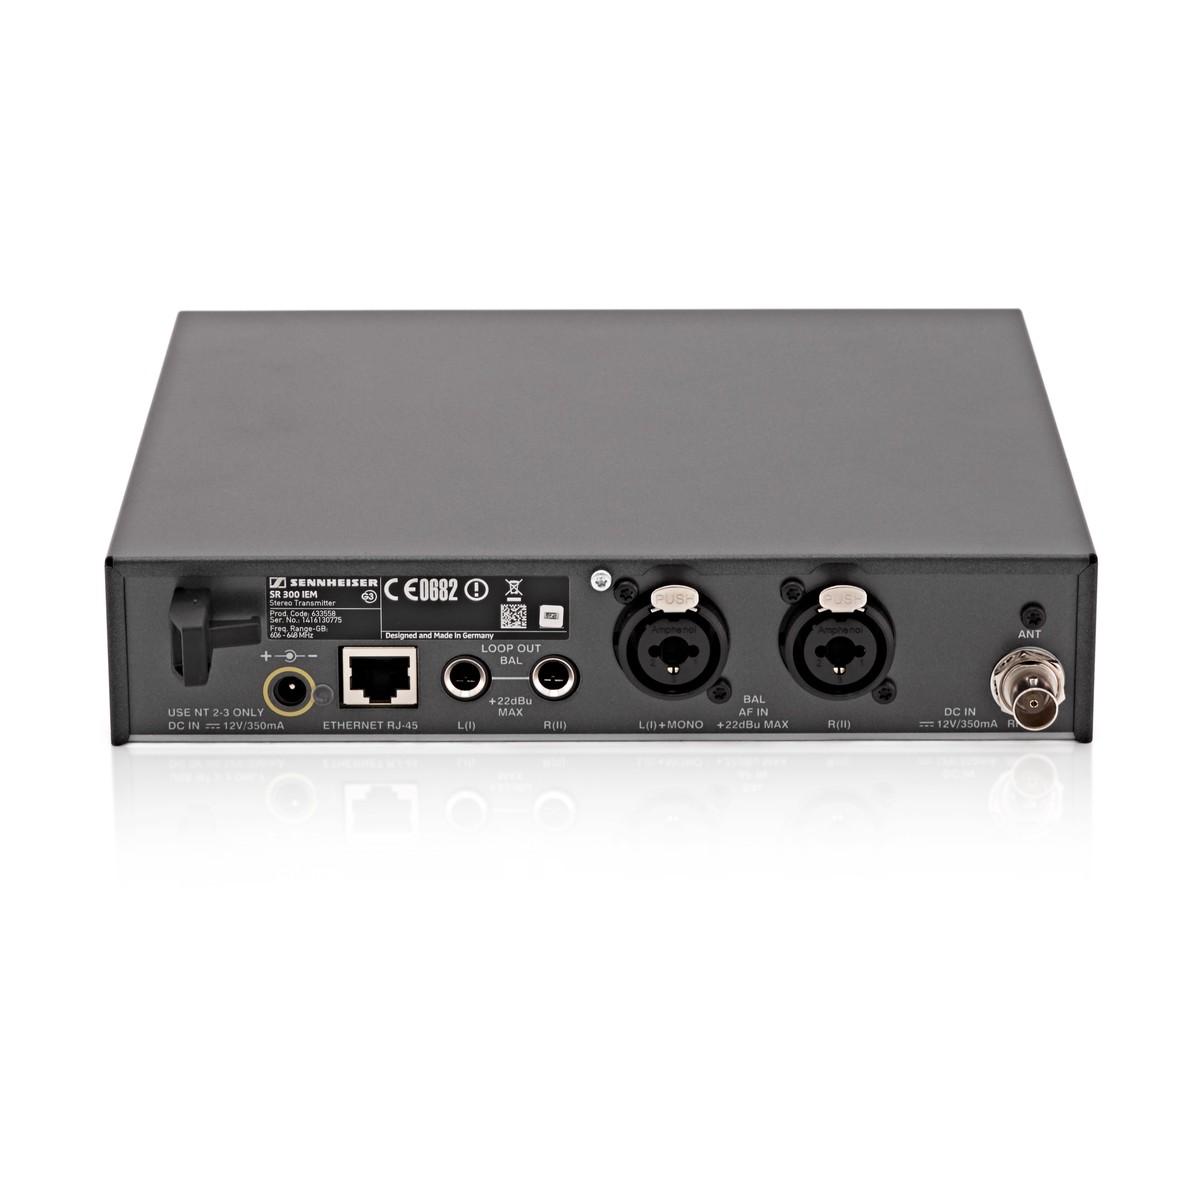 Sennheiser Ew 300 Iem : sennheiser ew 300 iem g3 e wireless in ear monitor system at gear4music ~ Hamham.info Haus und Dekorationen